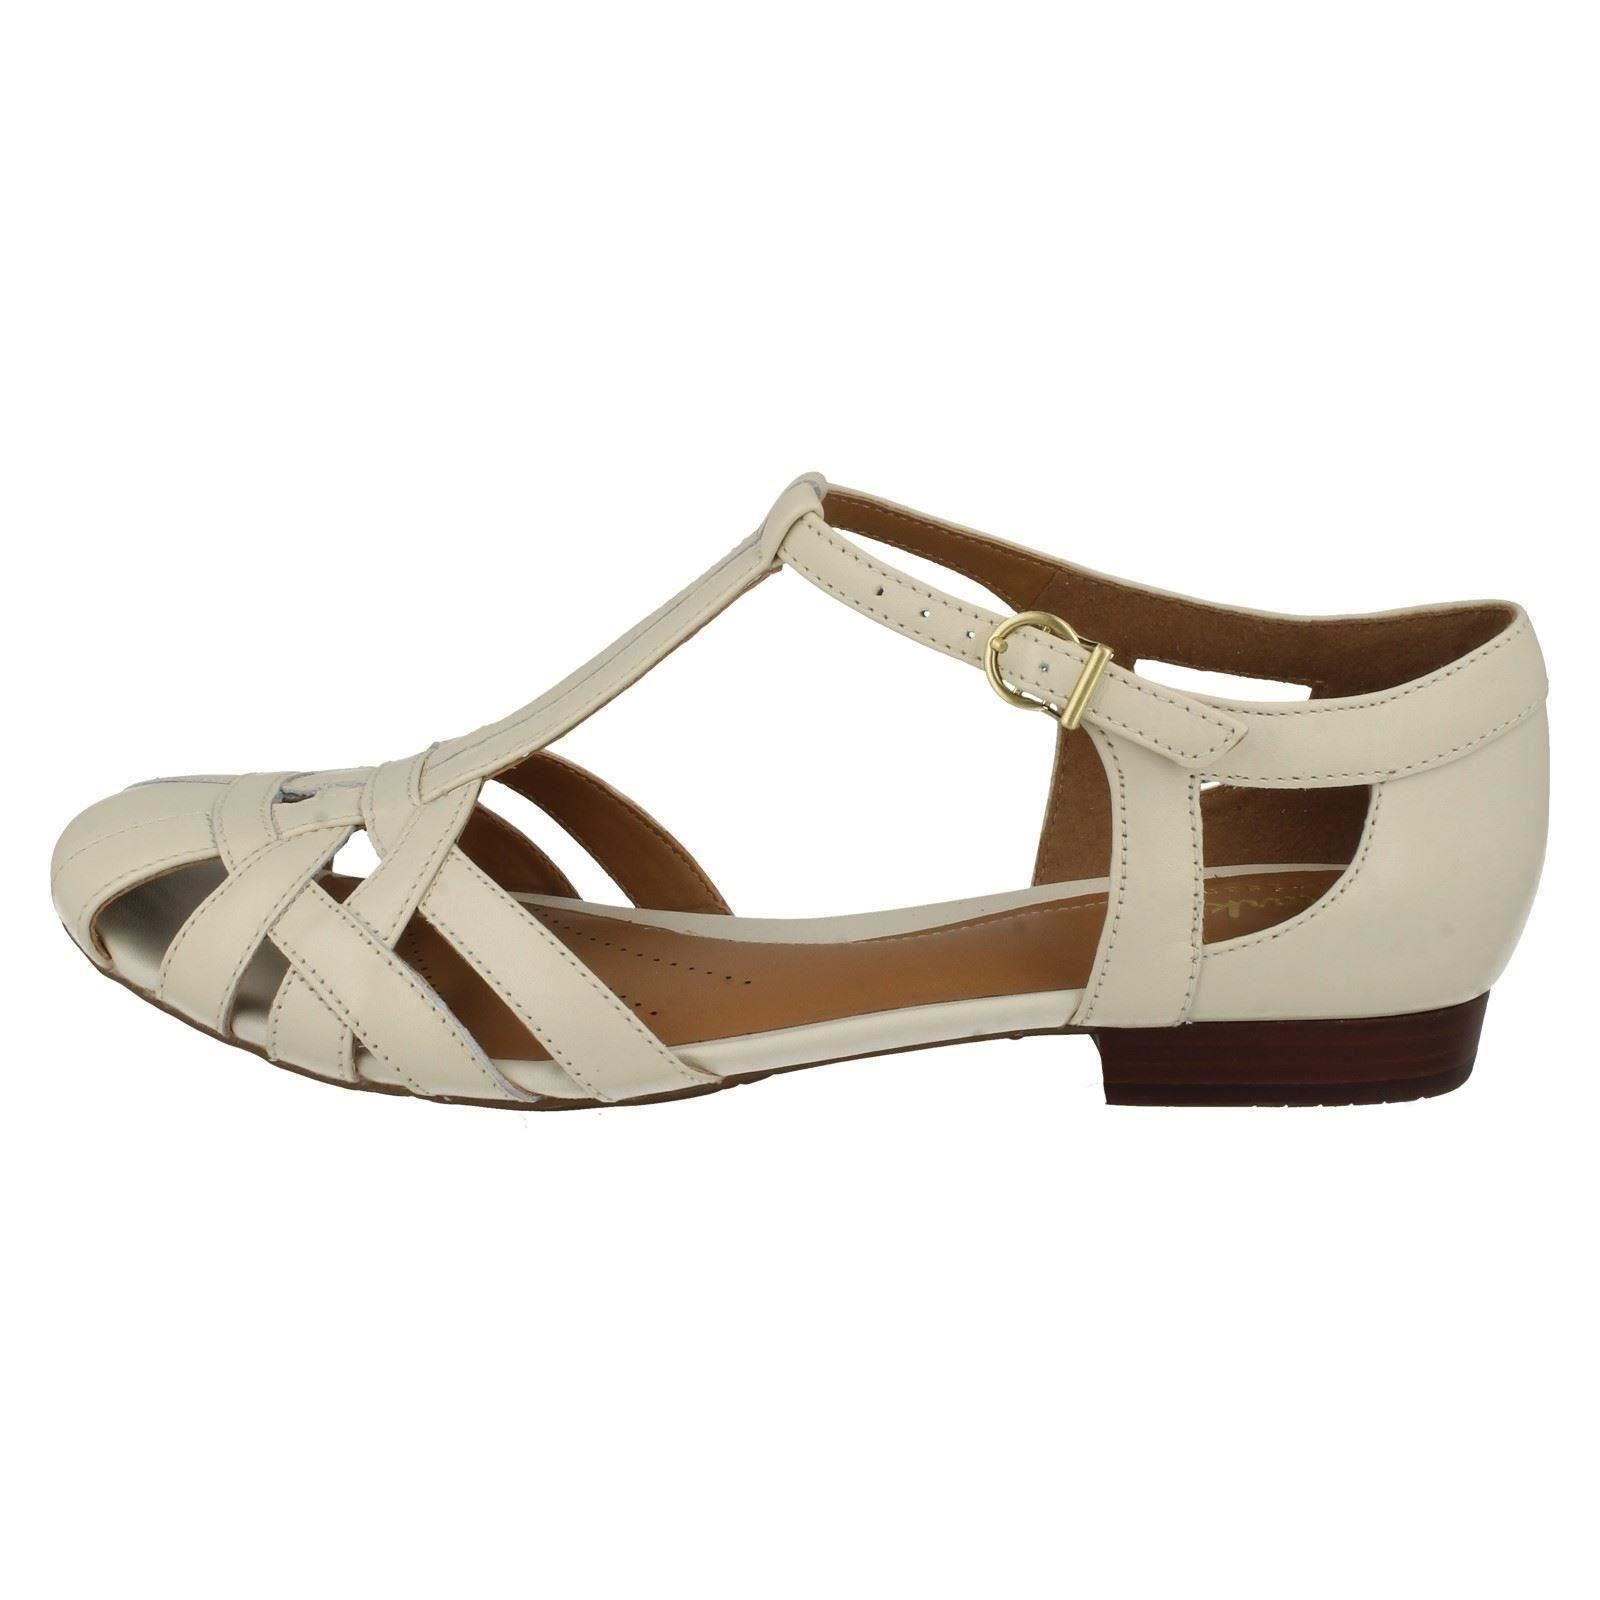 e0eaaa7fd287 Ladies-Clarks-Summer-Shoes-Henderson-Luck thumbnail 11